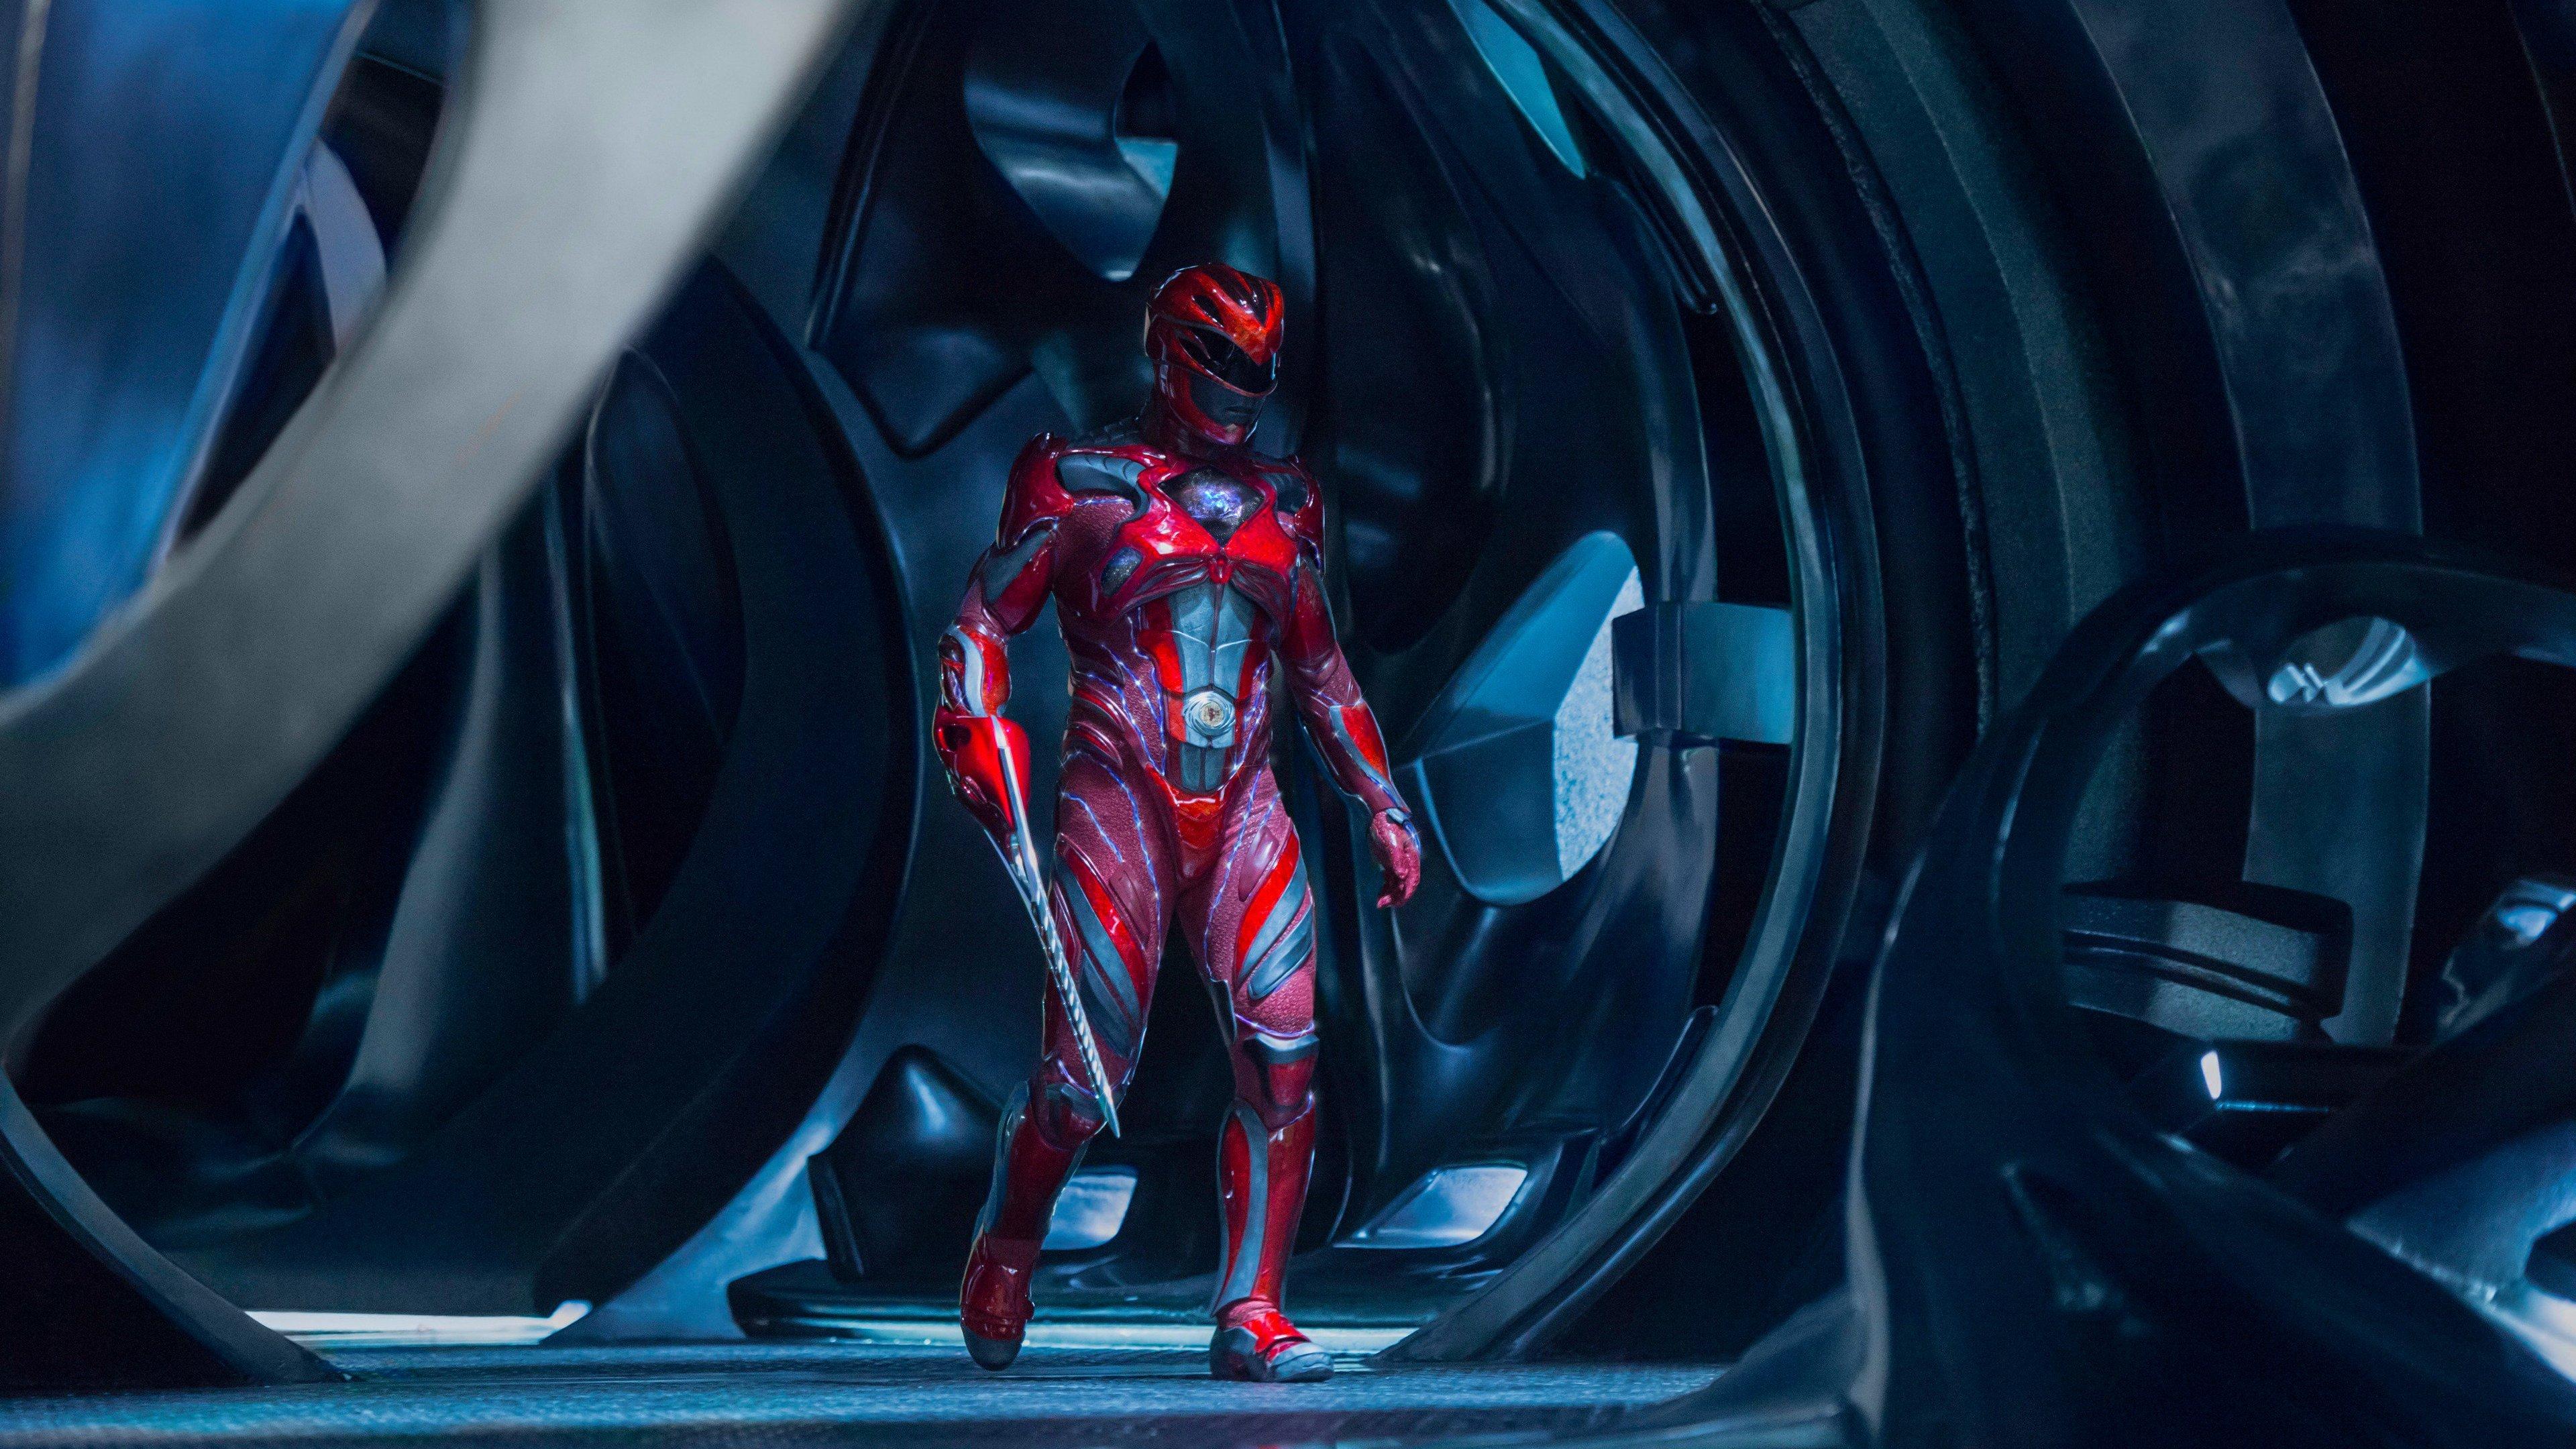 Wallpaper 4k Red Power Ranger 2017 movies wallpapers 4k 3840x2160